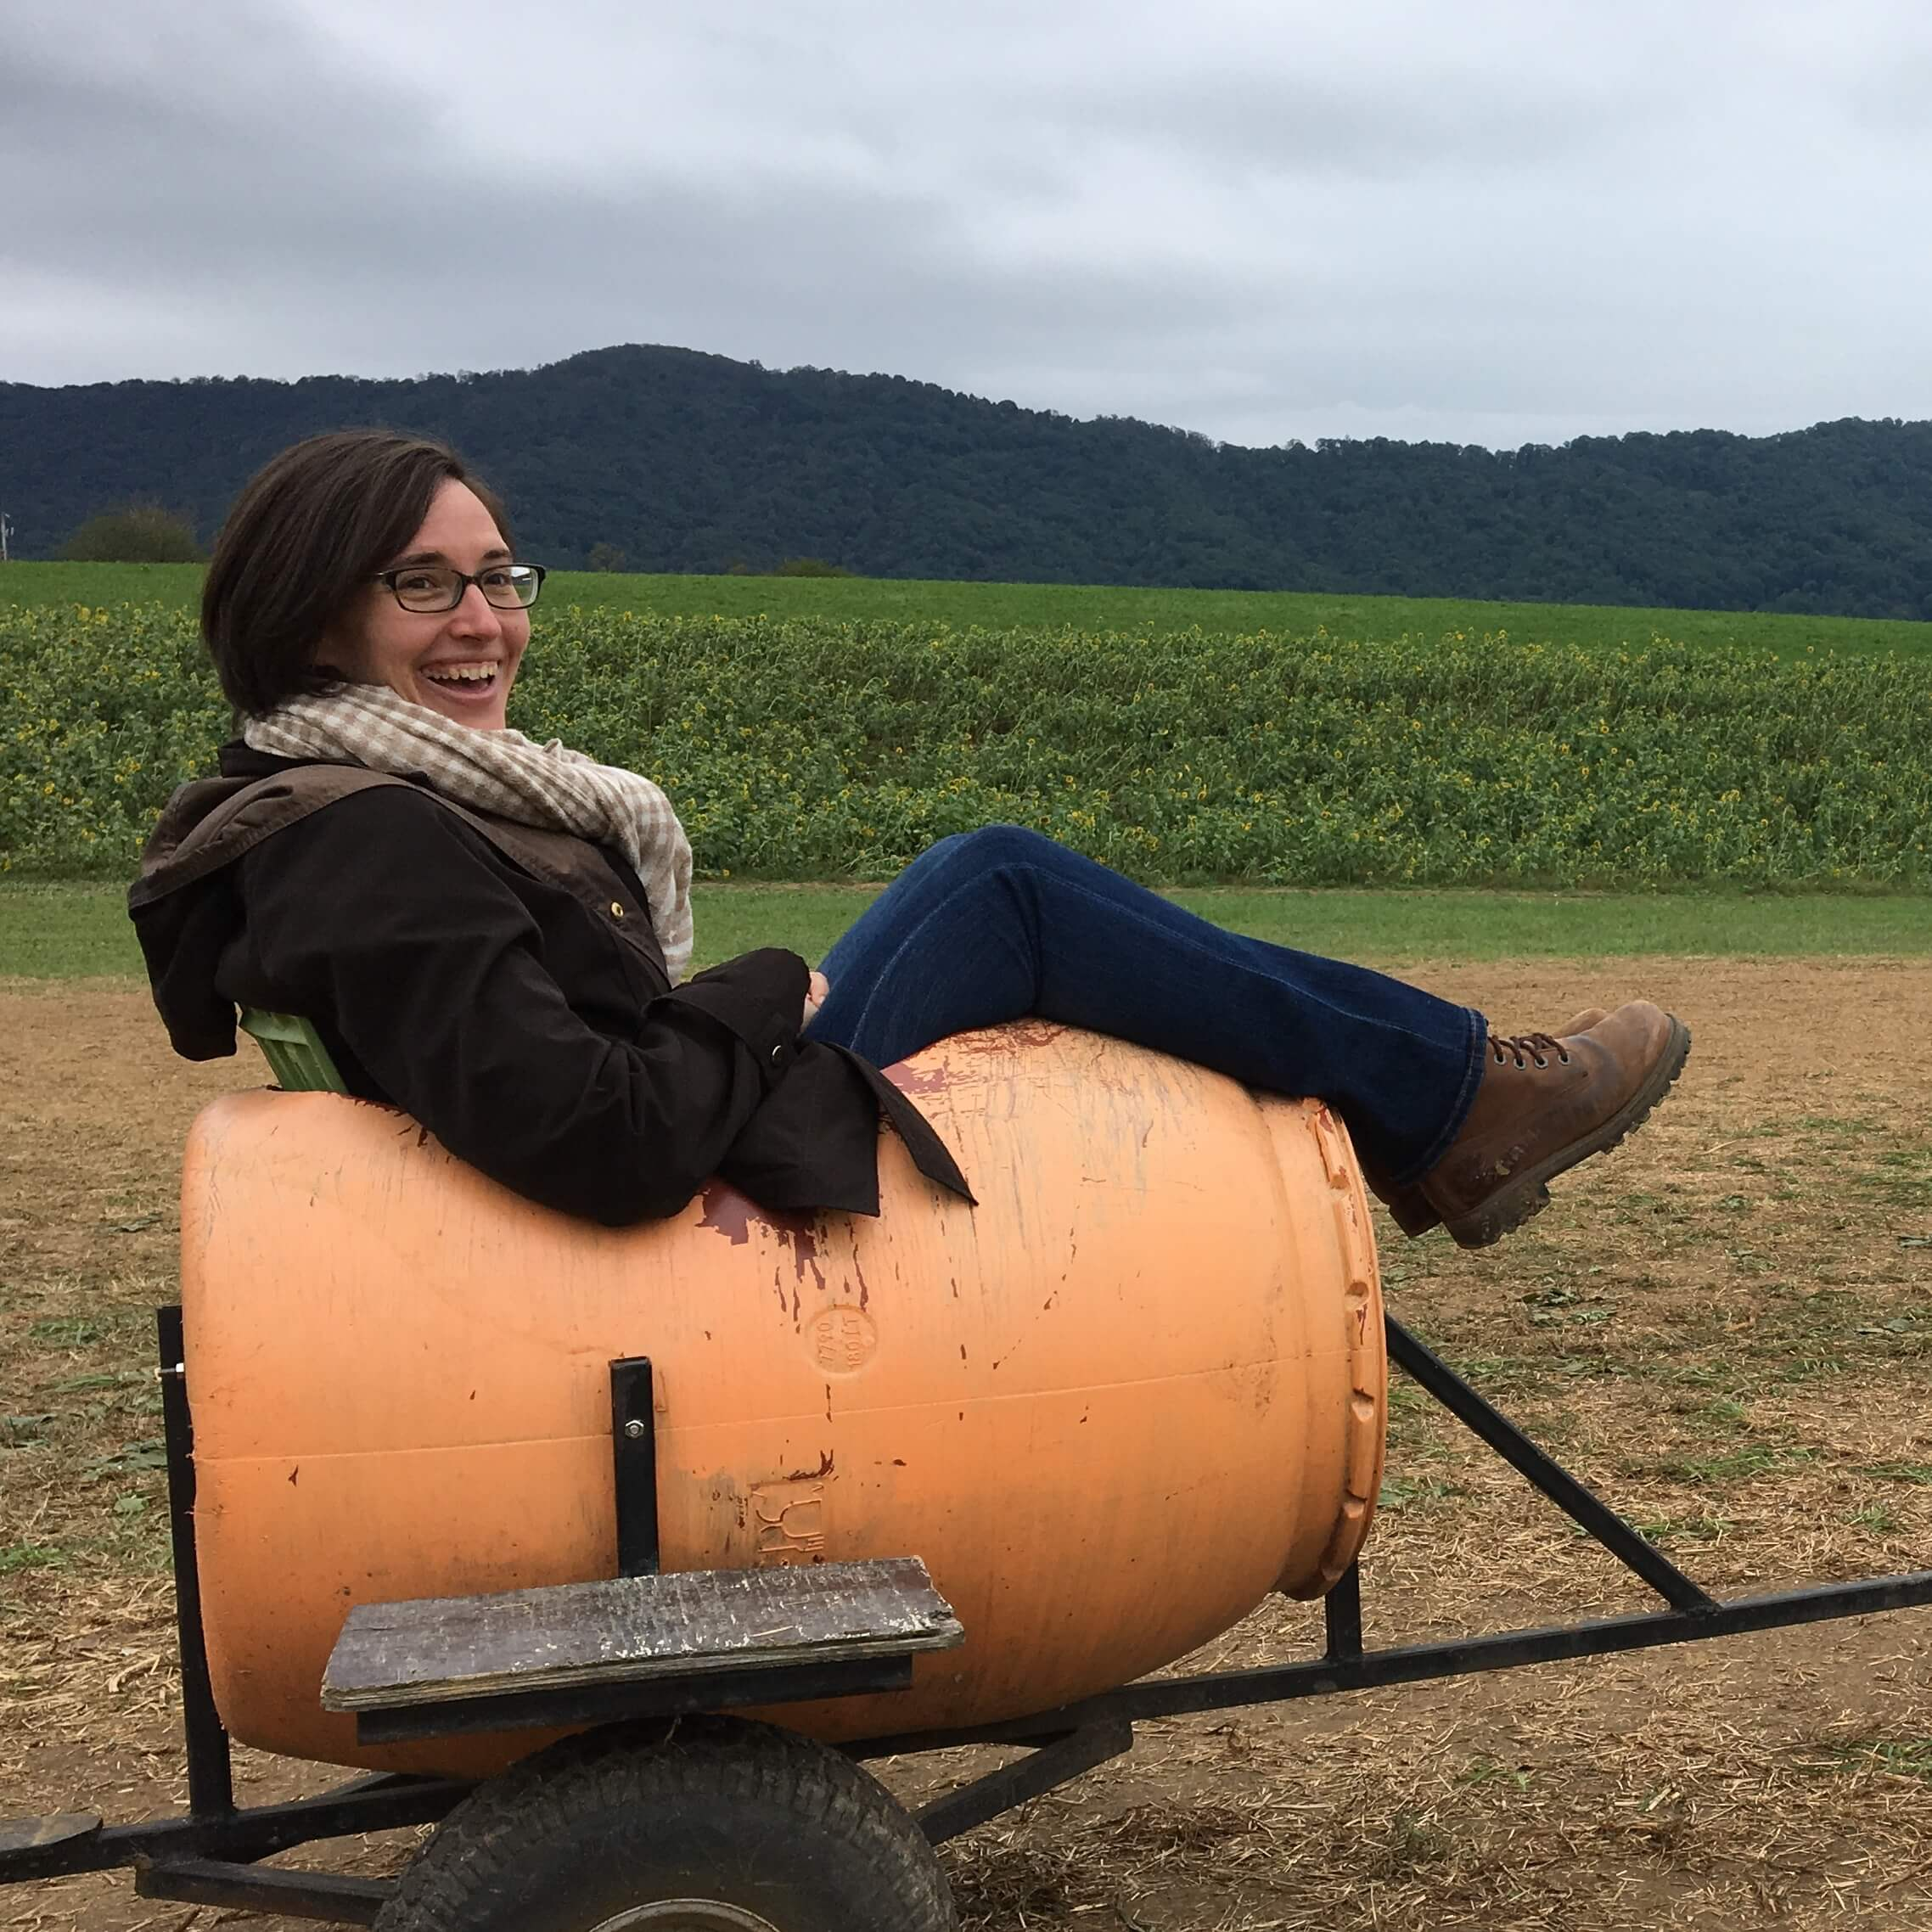 Ride in a barrel train car at fall farm festival